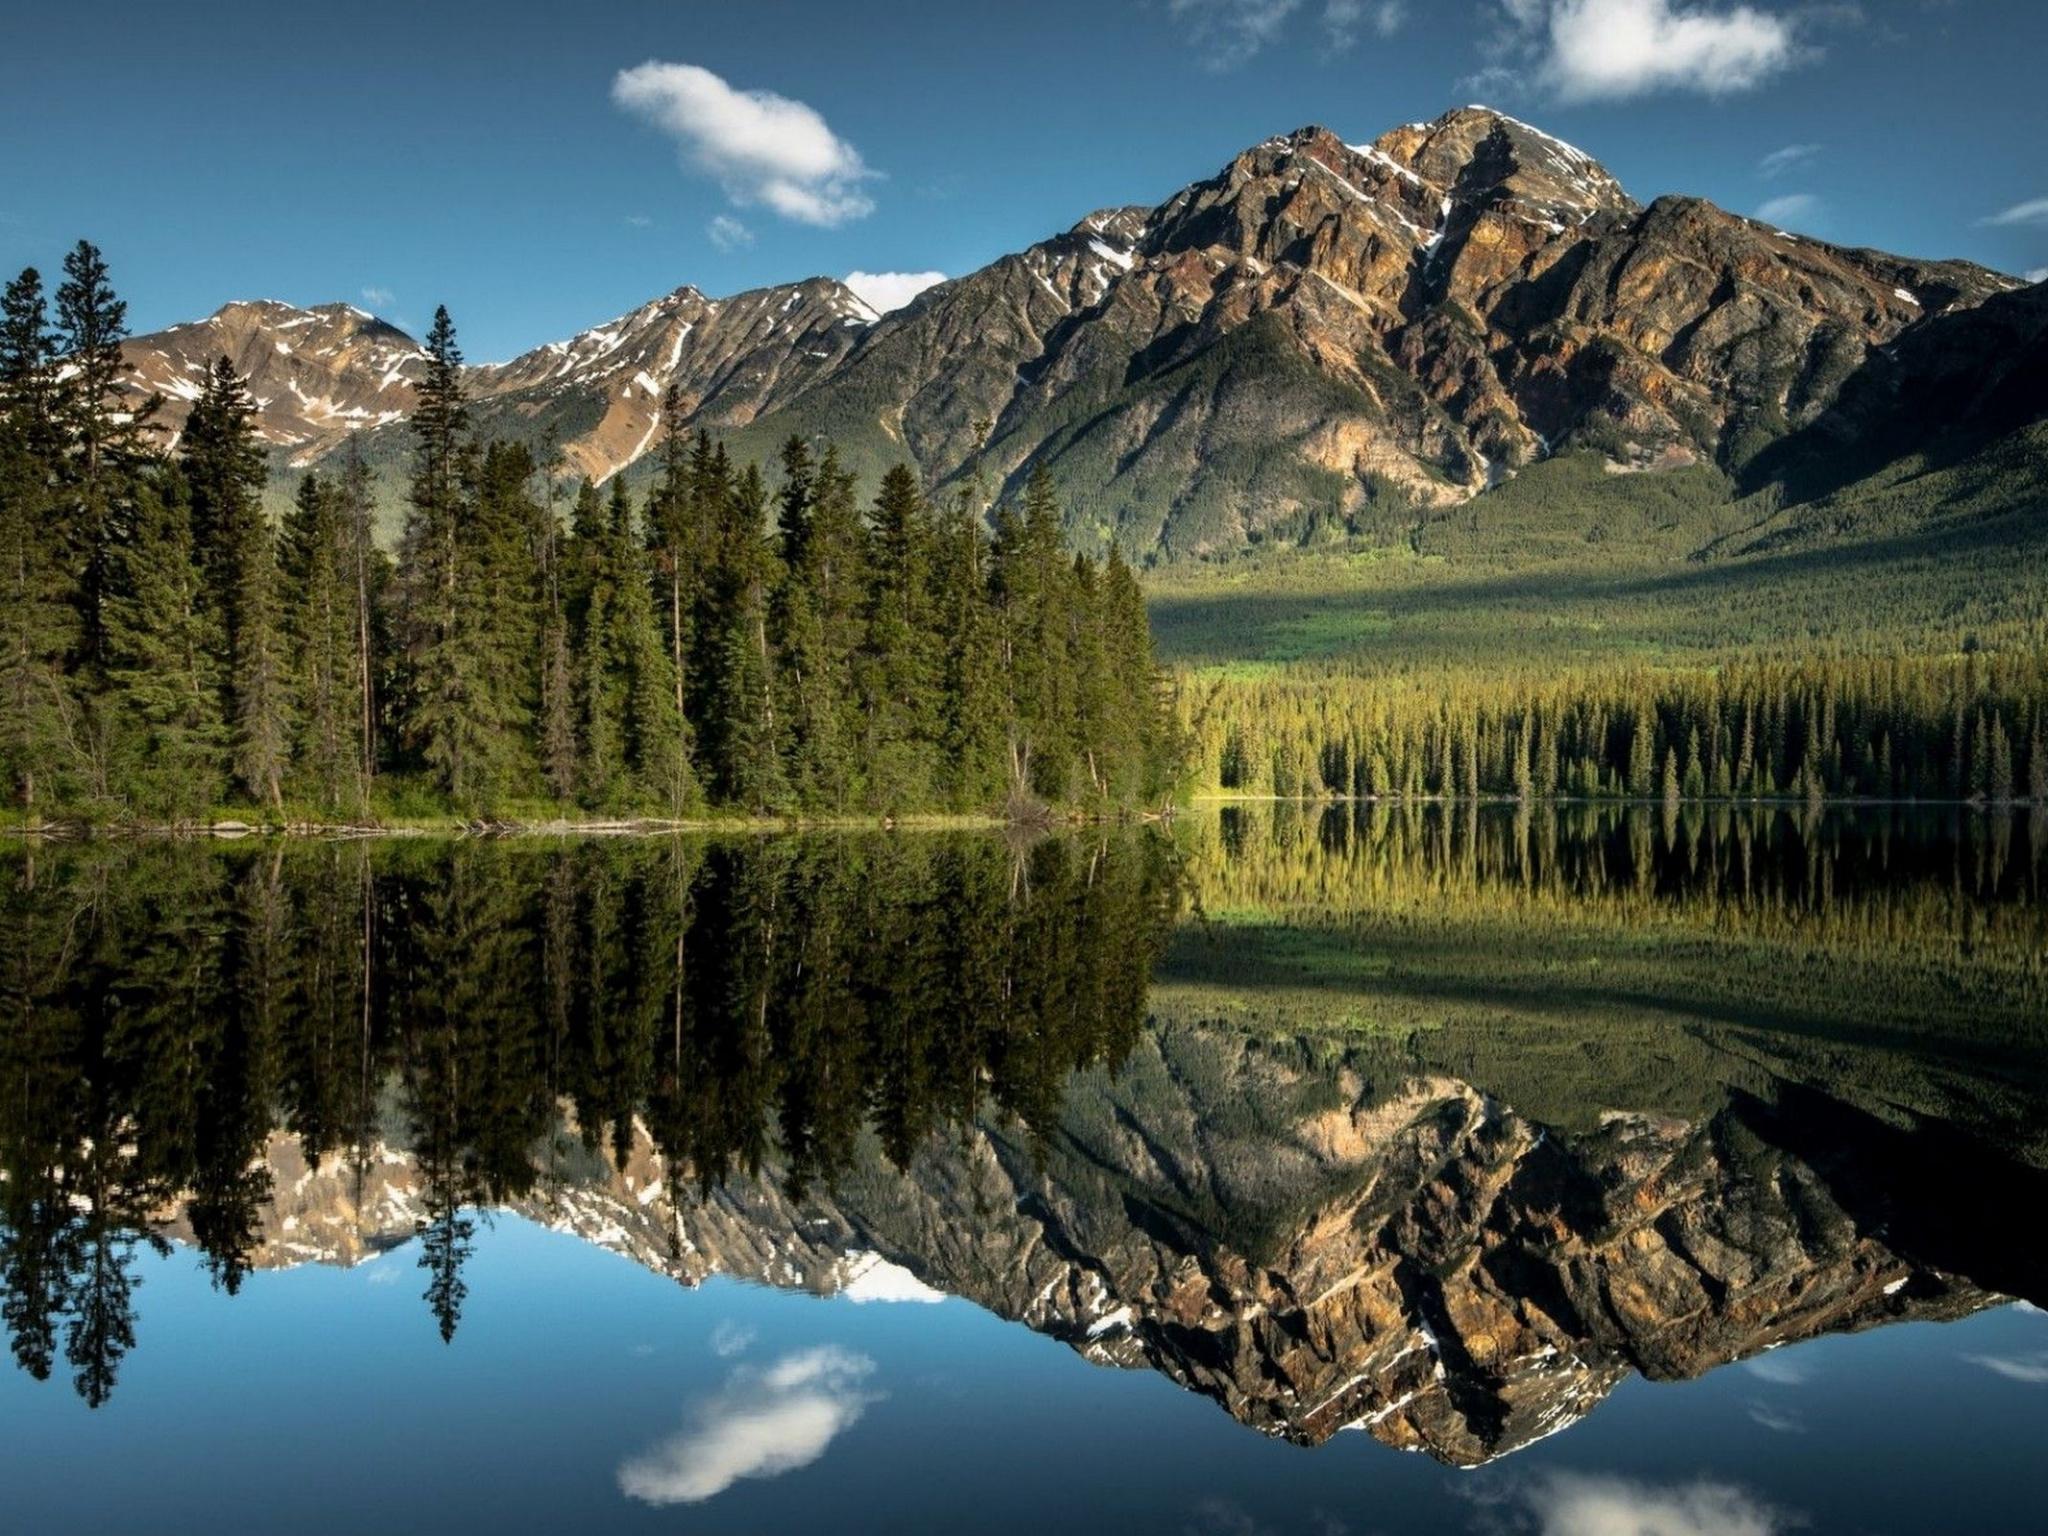 Jasper, National Park, Park, Sky, Mountain Wallpaper - Forest Mirror Water , HD Wallpaper & Backgrounds